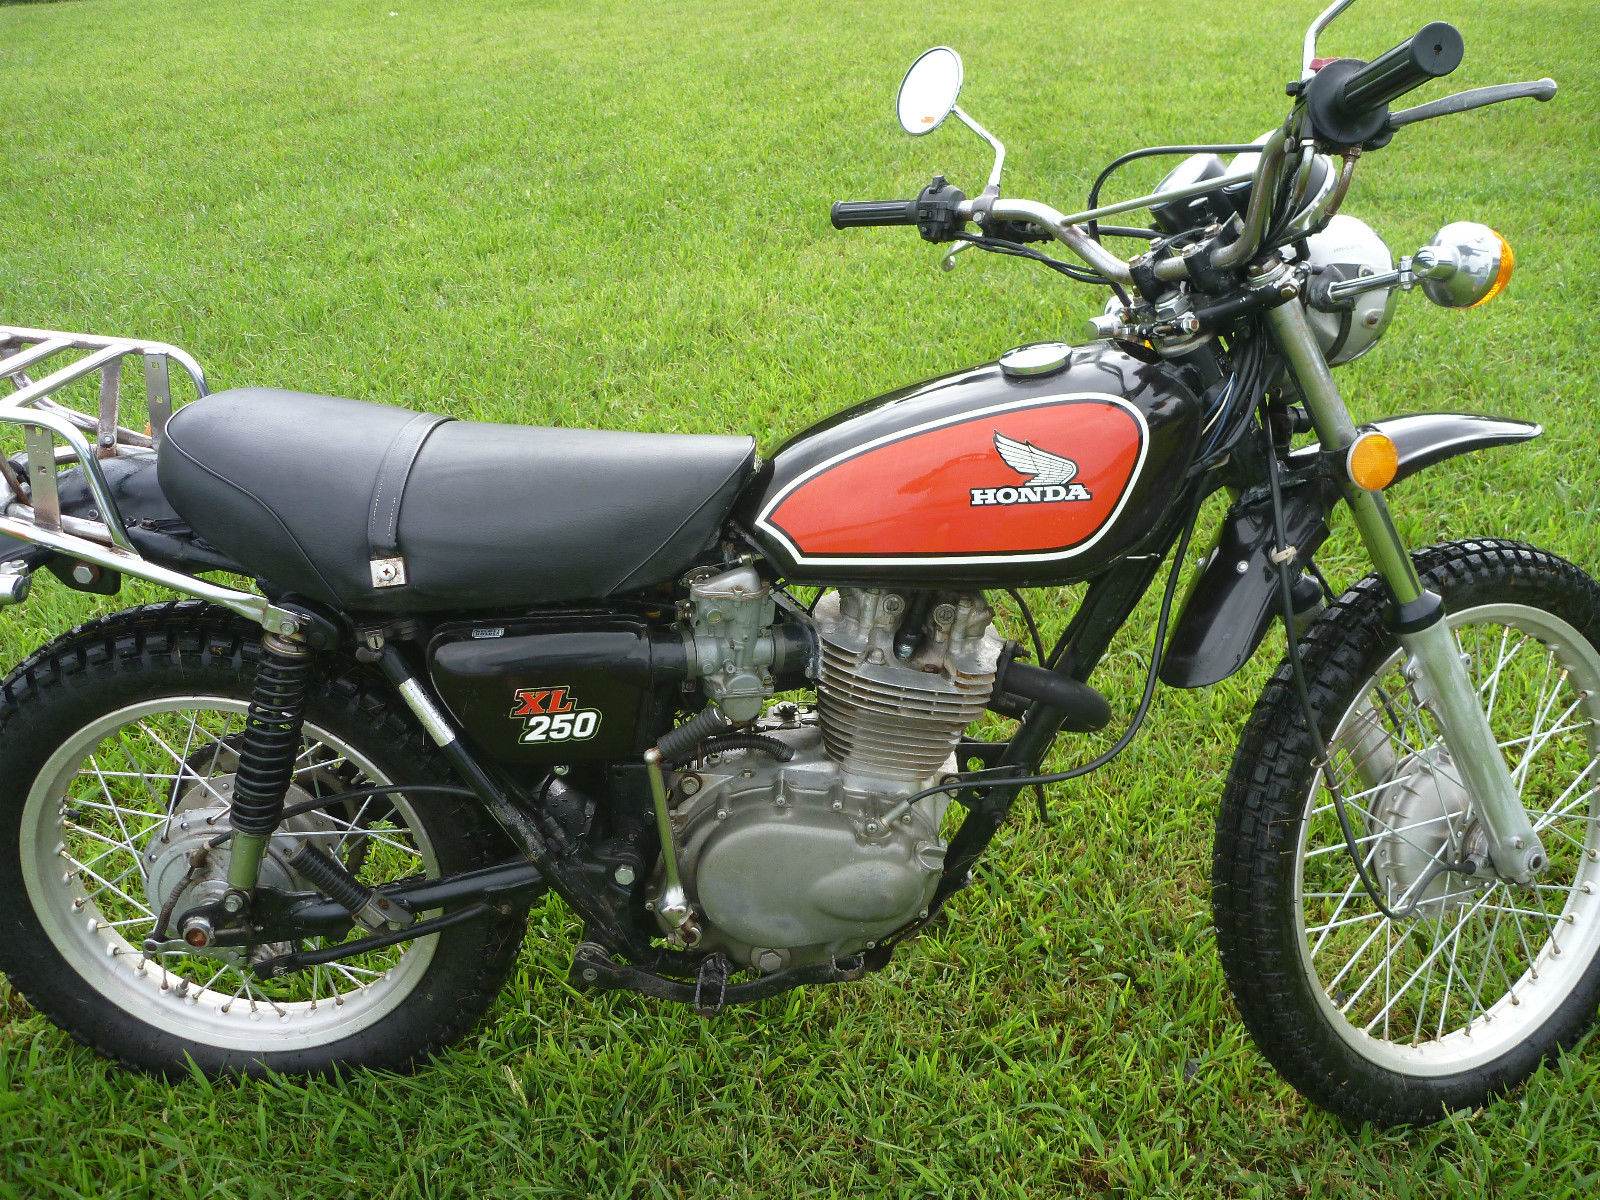 vintage 1975 honda xl 250 enduro motorcycle trail bike. Black Bedroom Furniture Sets. Home Design Ideas